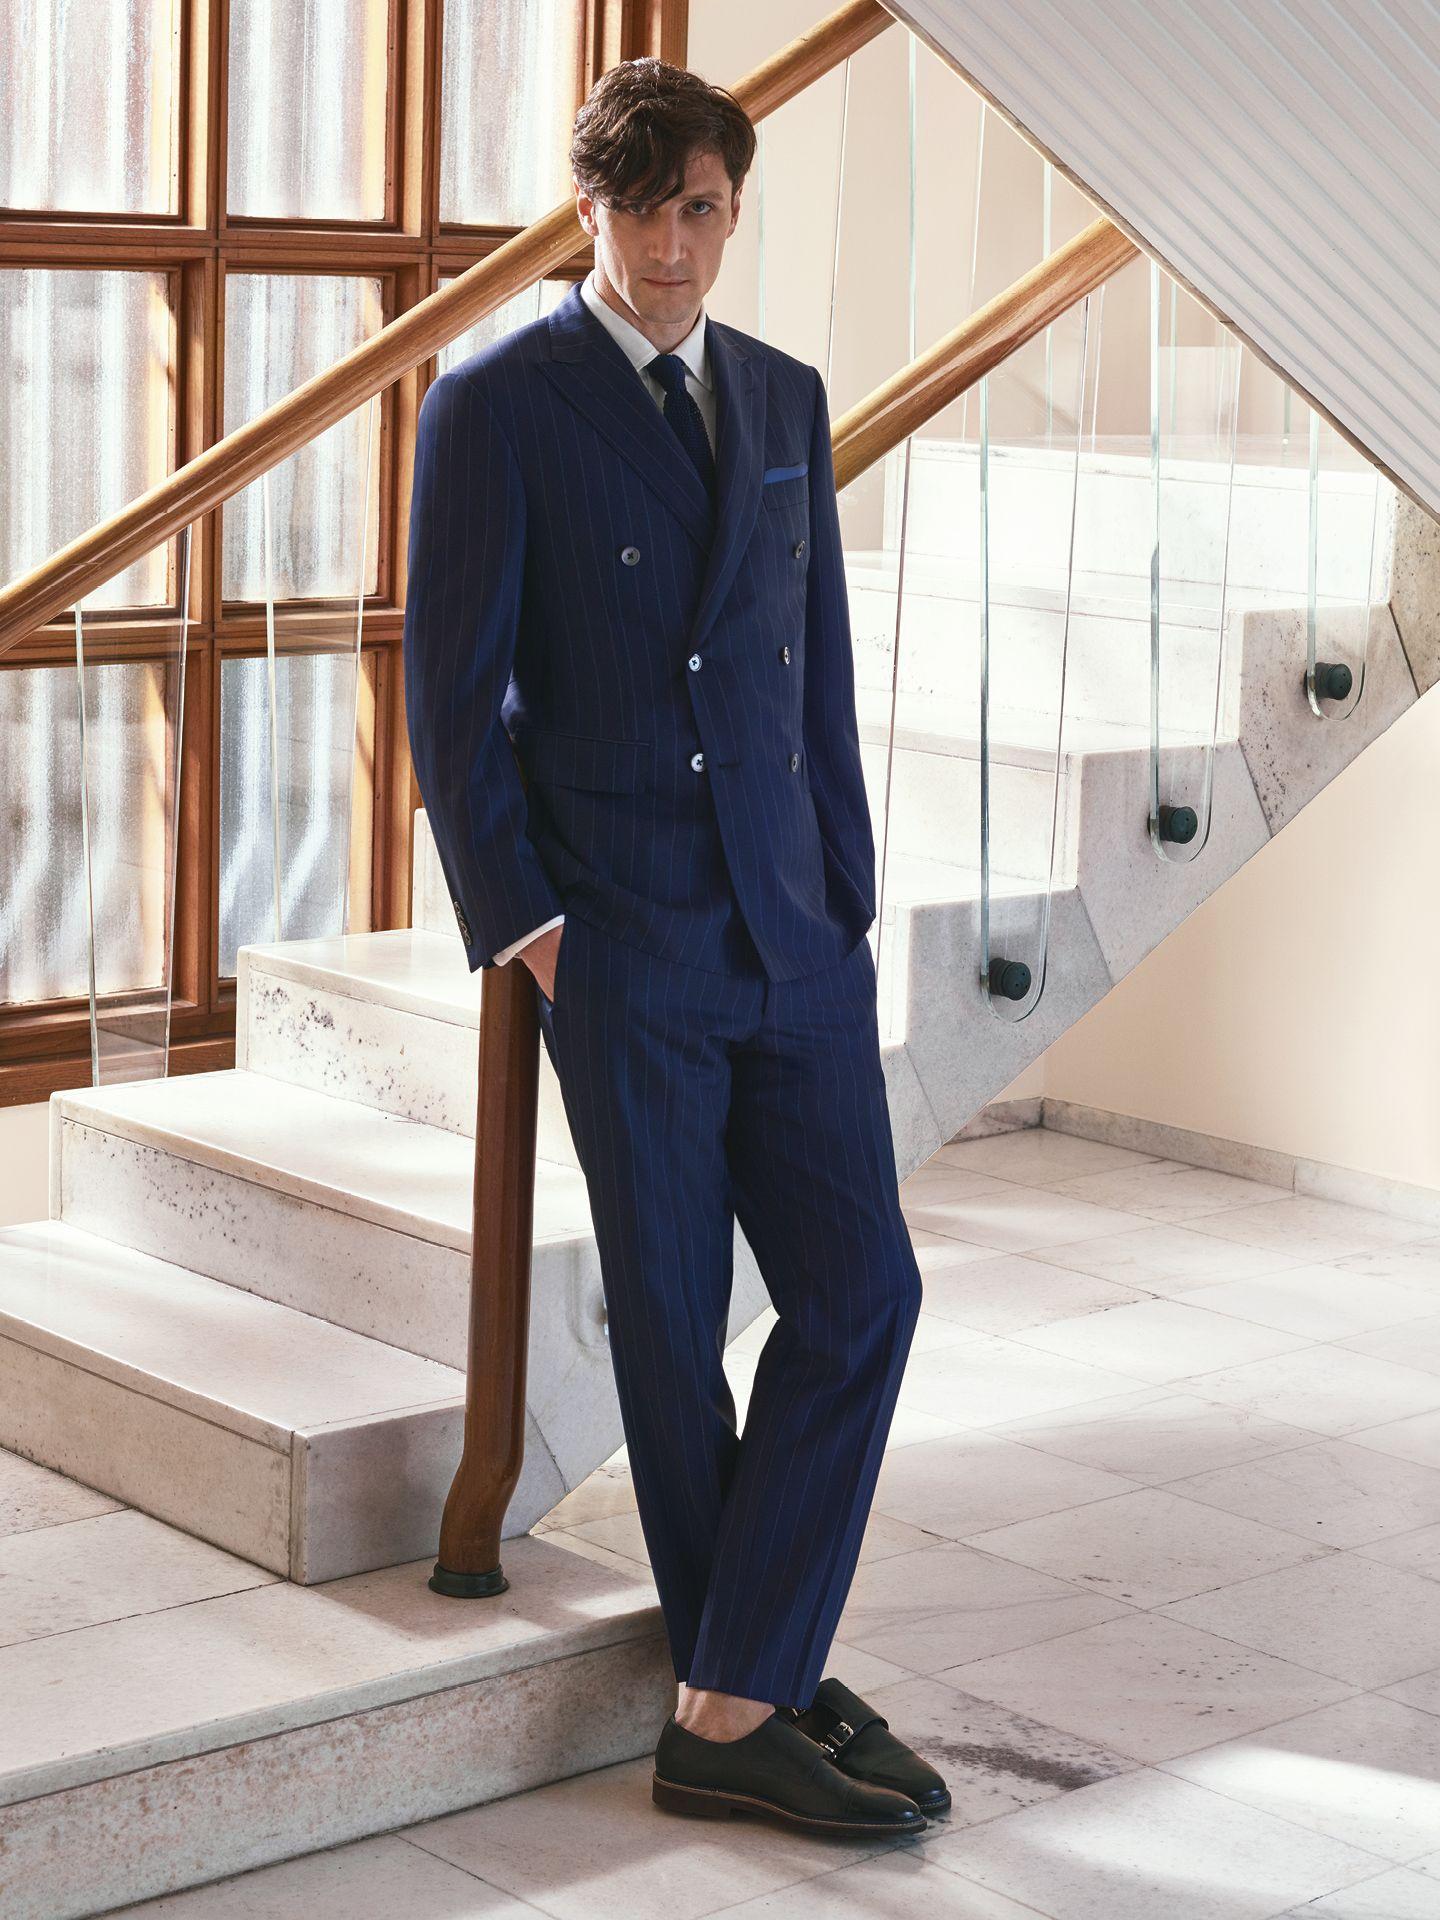 b55028bd79 Suit in Flawless wool, pinstripe, navy blue. 6-button double ...